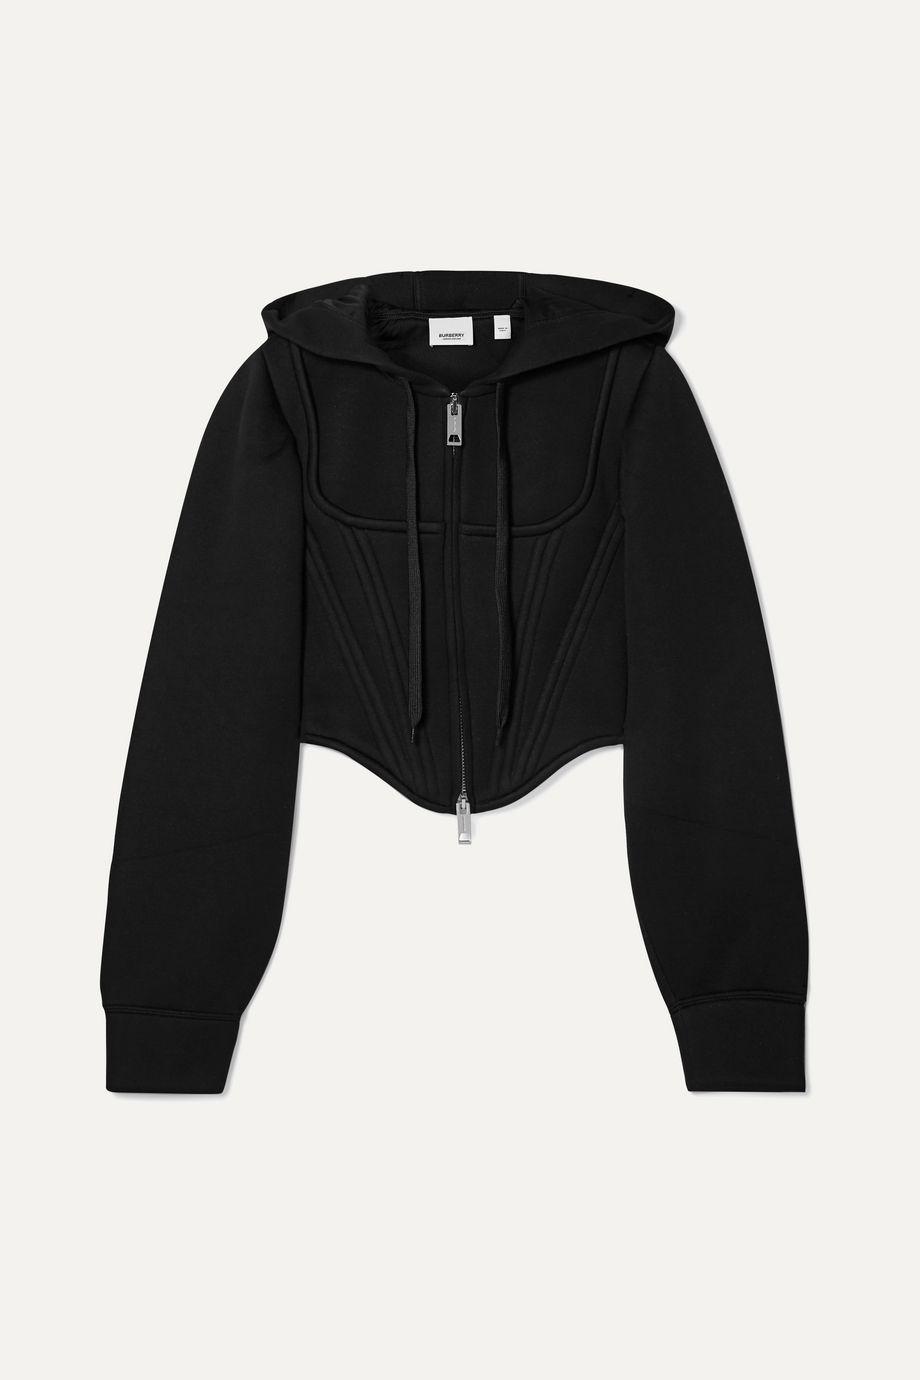 Burberry Cropped paneled modal-neoprene hoodie